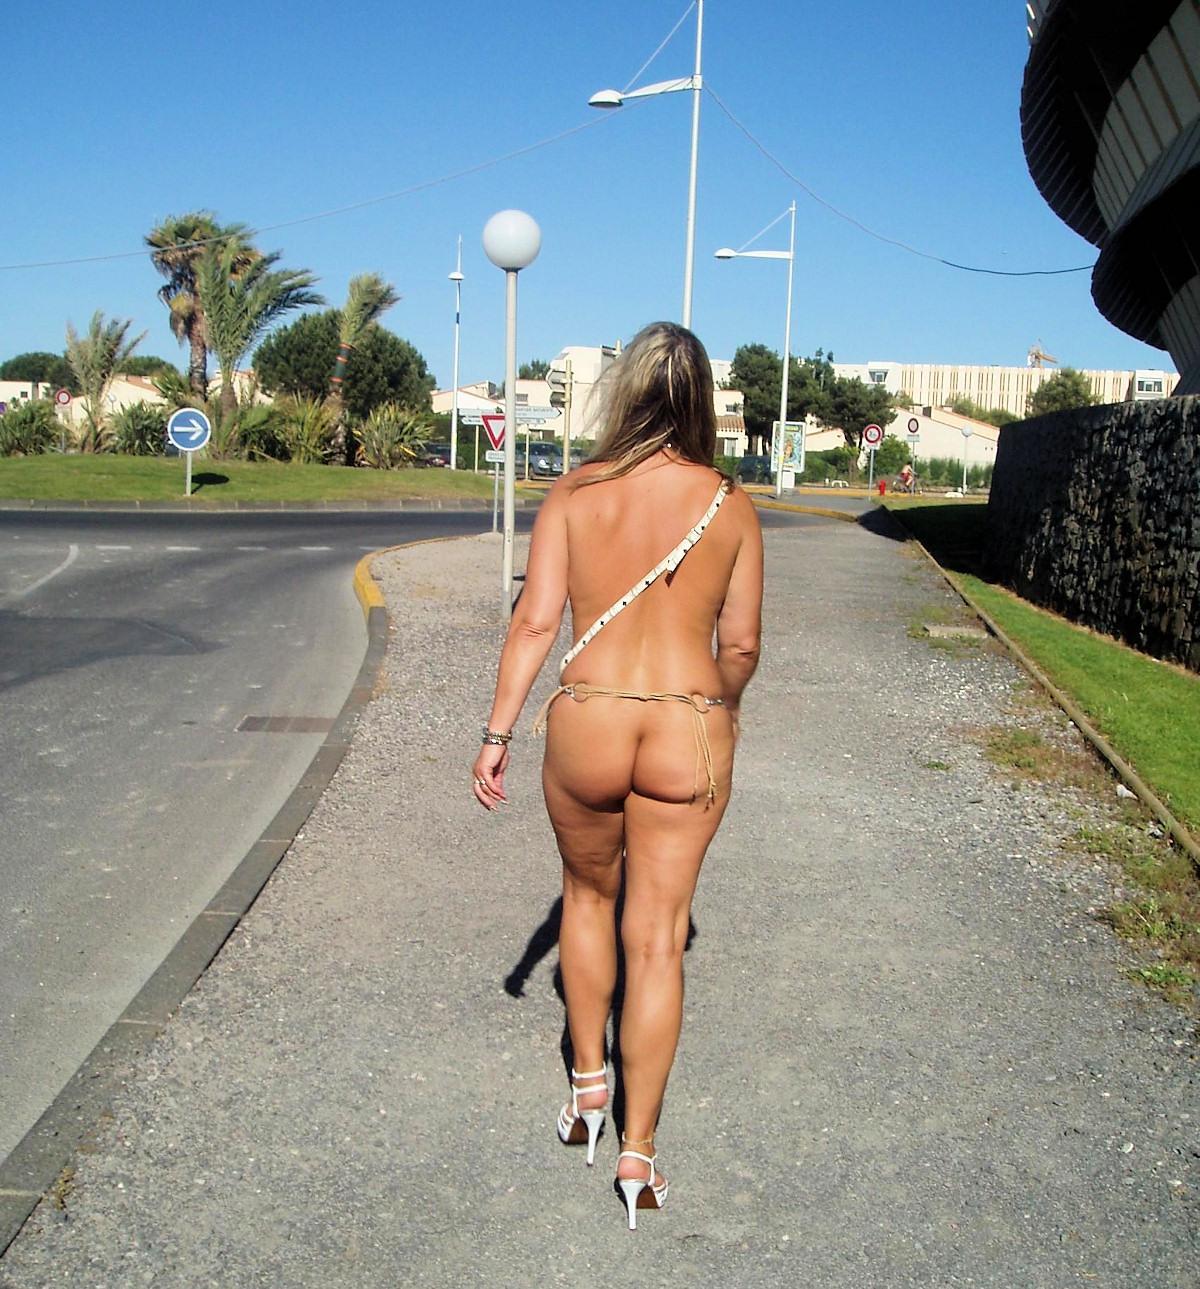 Nudist site reports